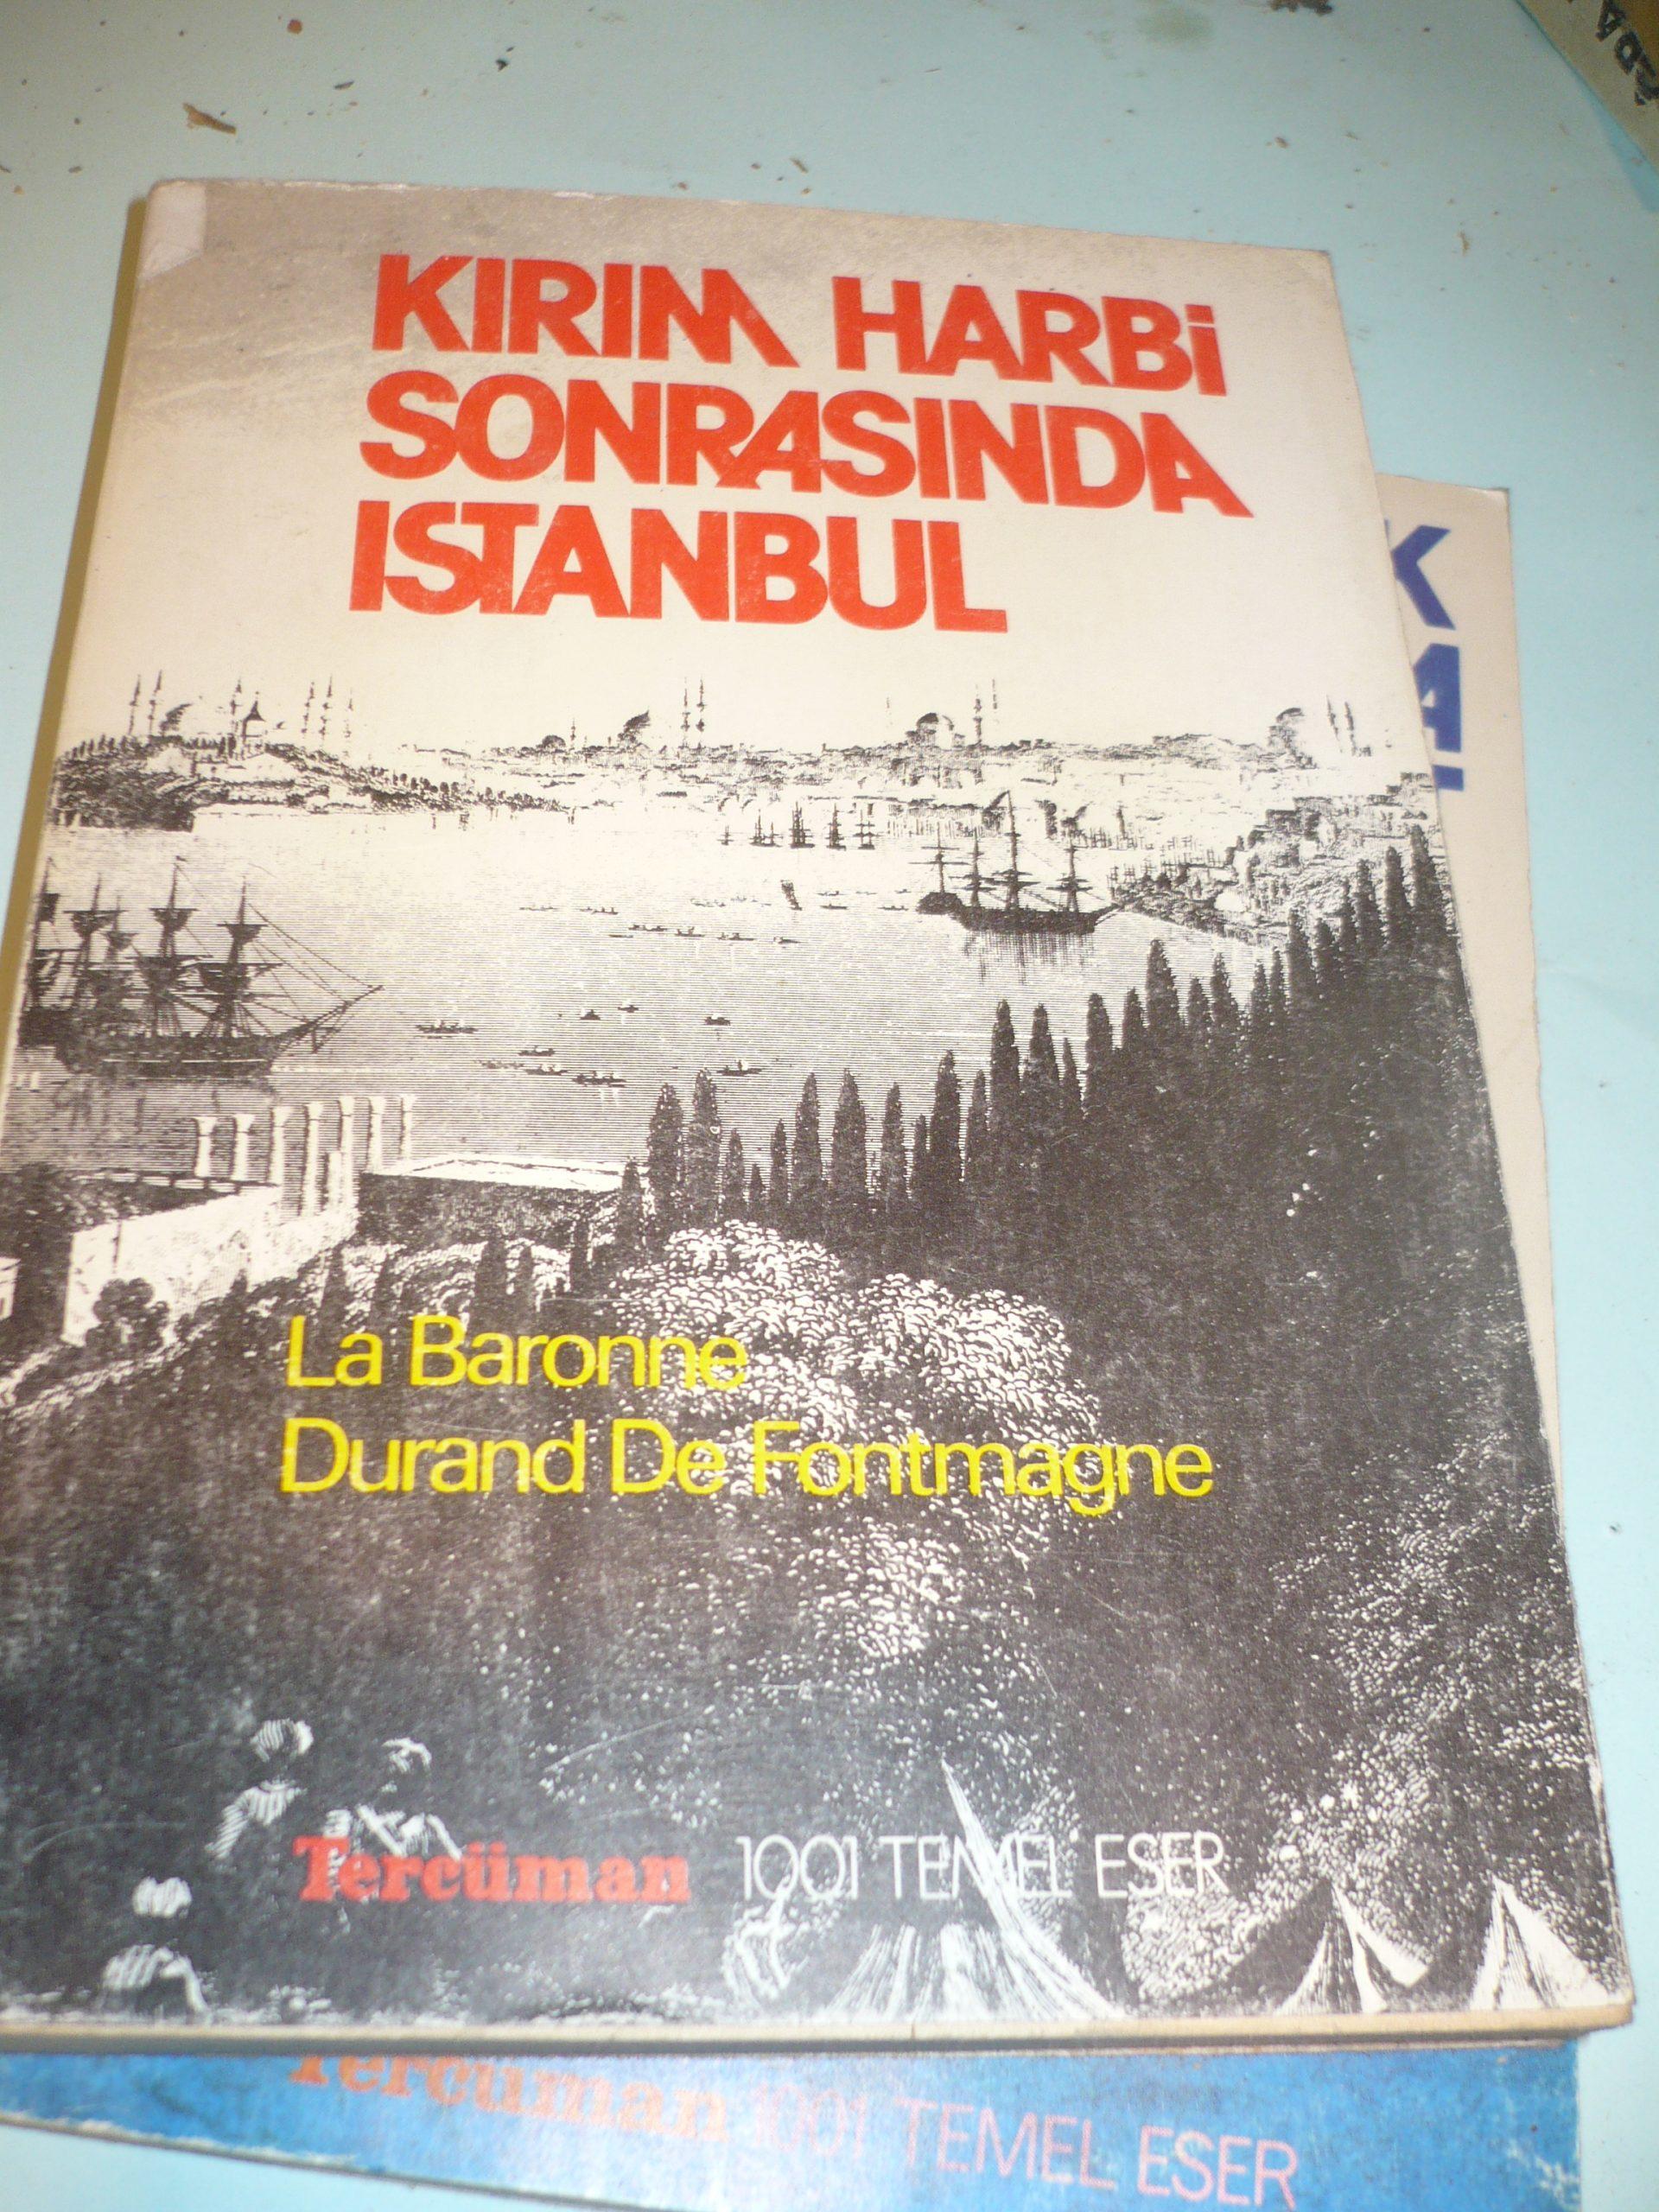 KIRIM HARBİ SONRASINDA İSTANBUL/La Baronne Durand De Fontmagne